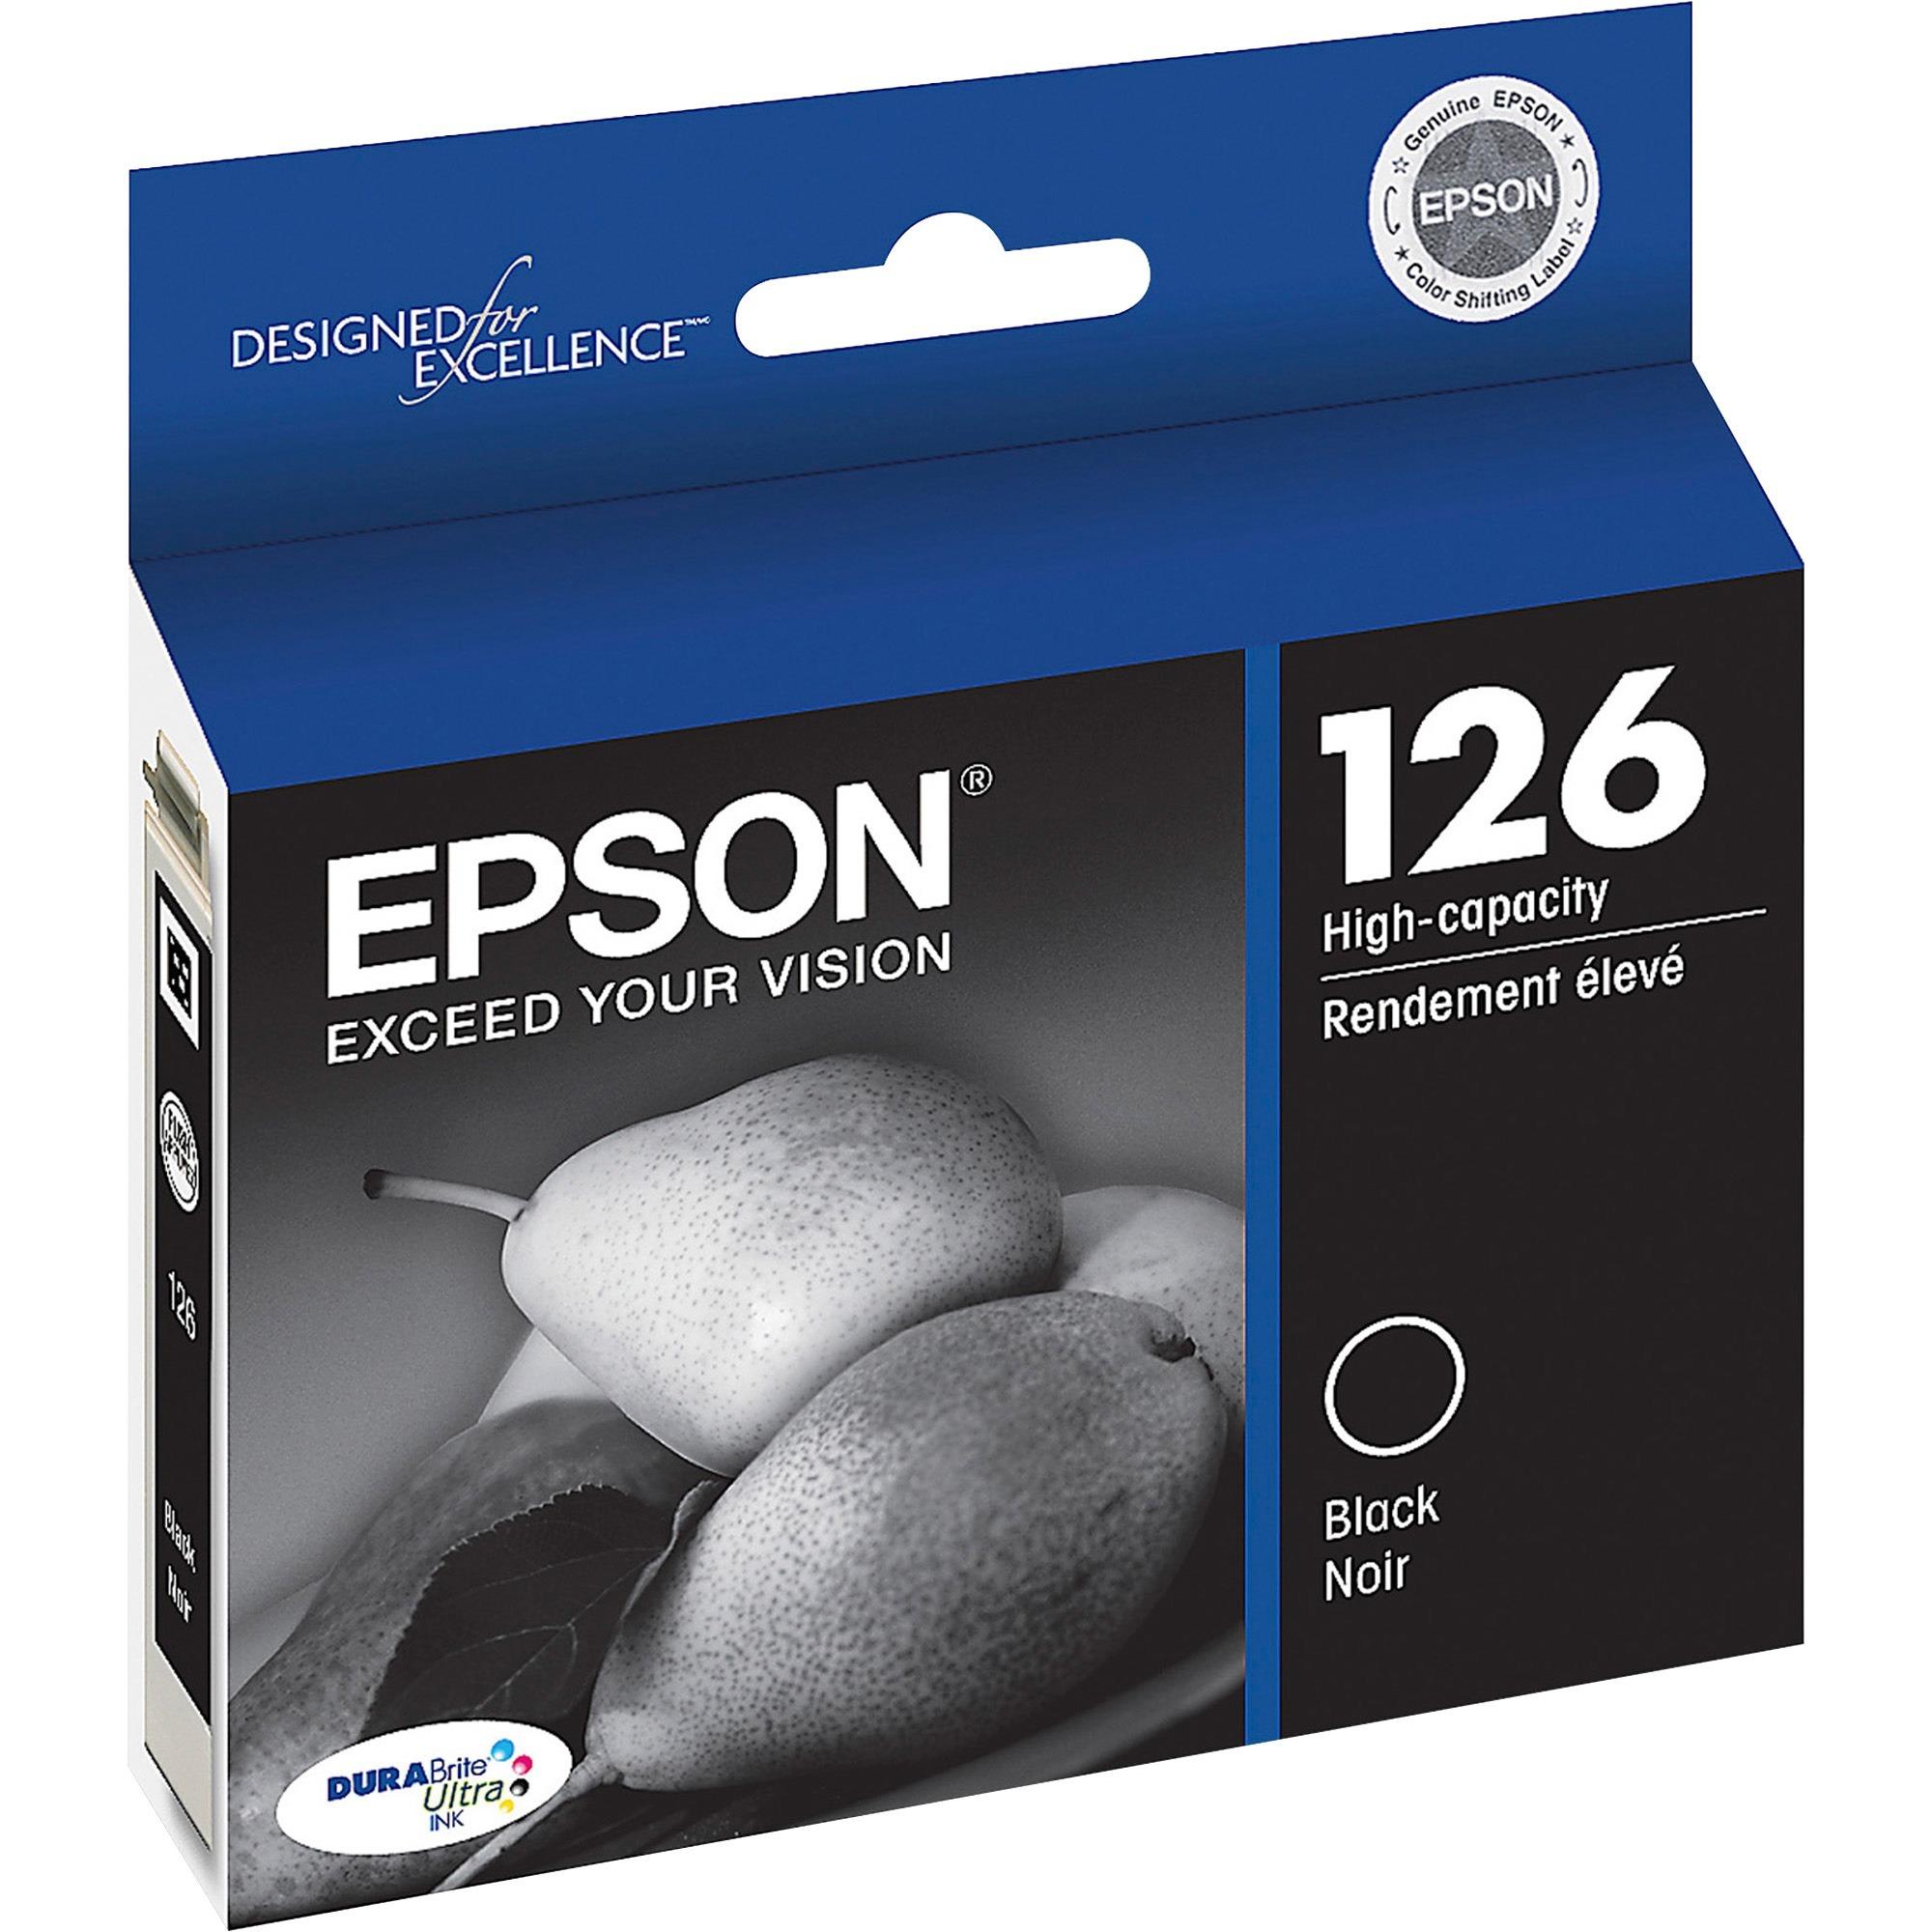 Epson 126 Standard-capacity Black Ink Cartridge